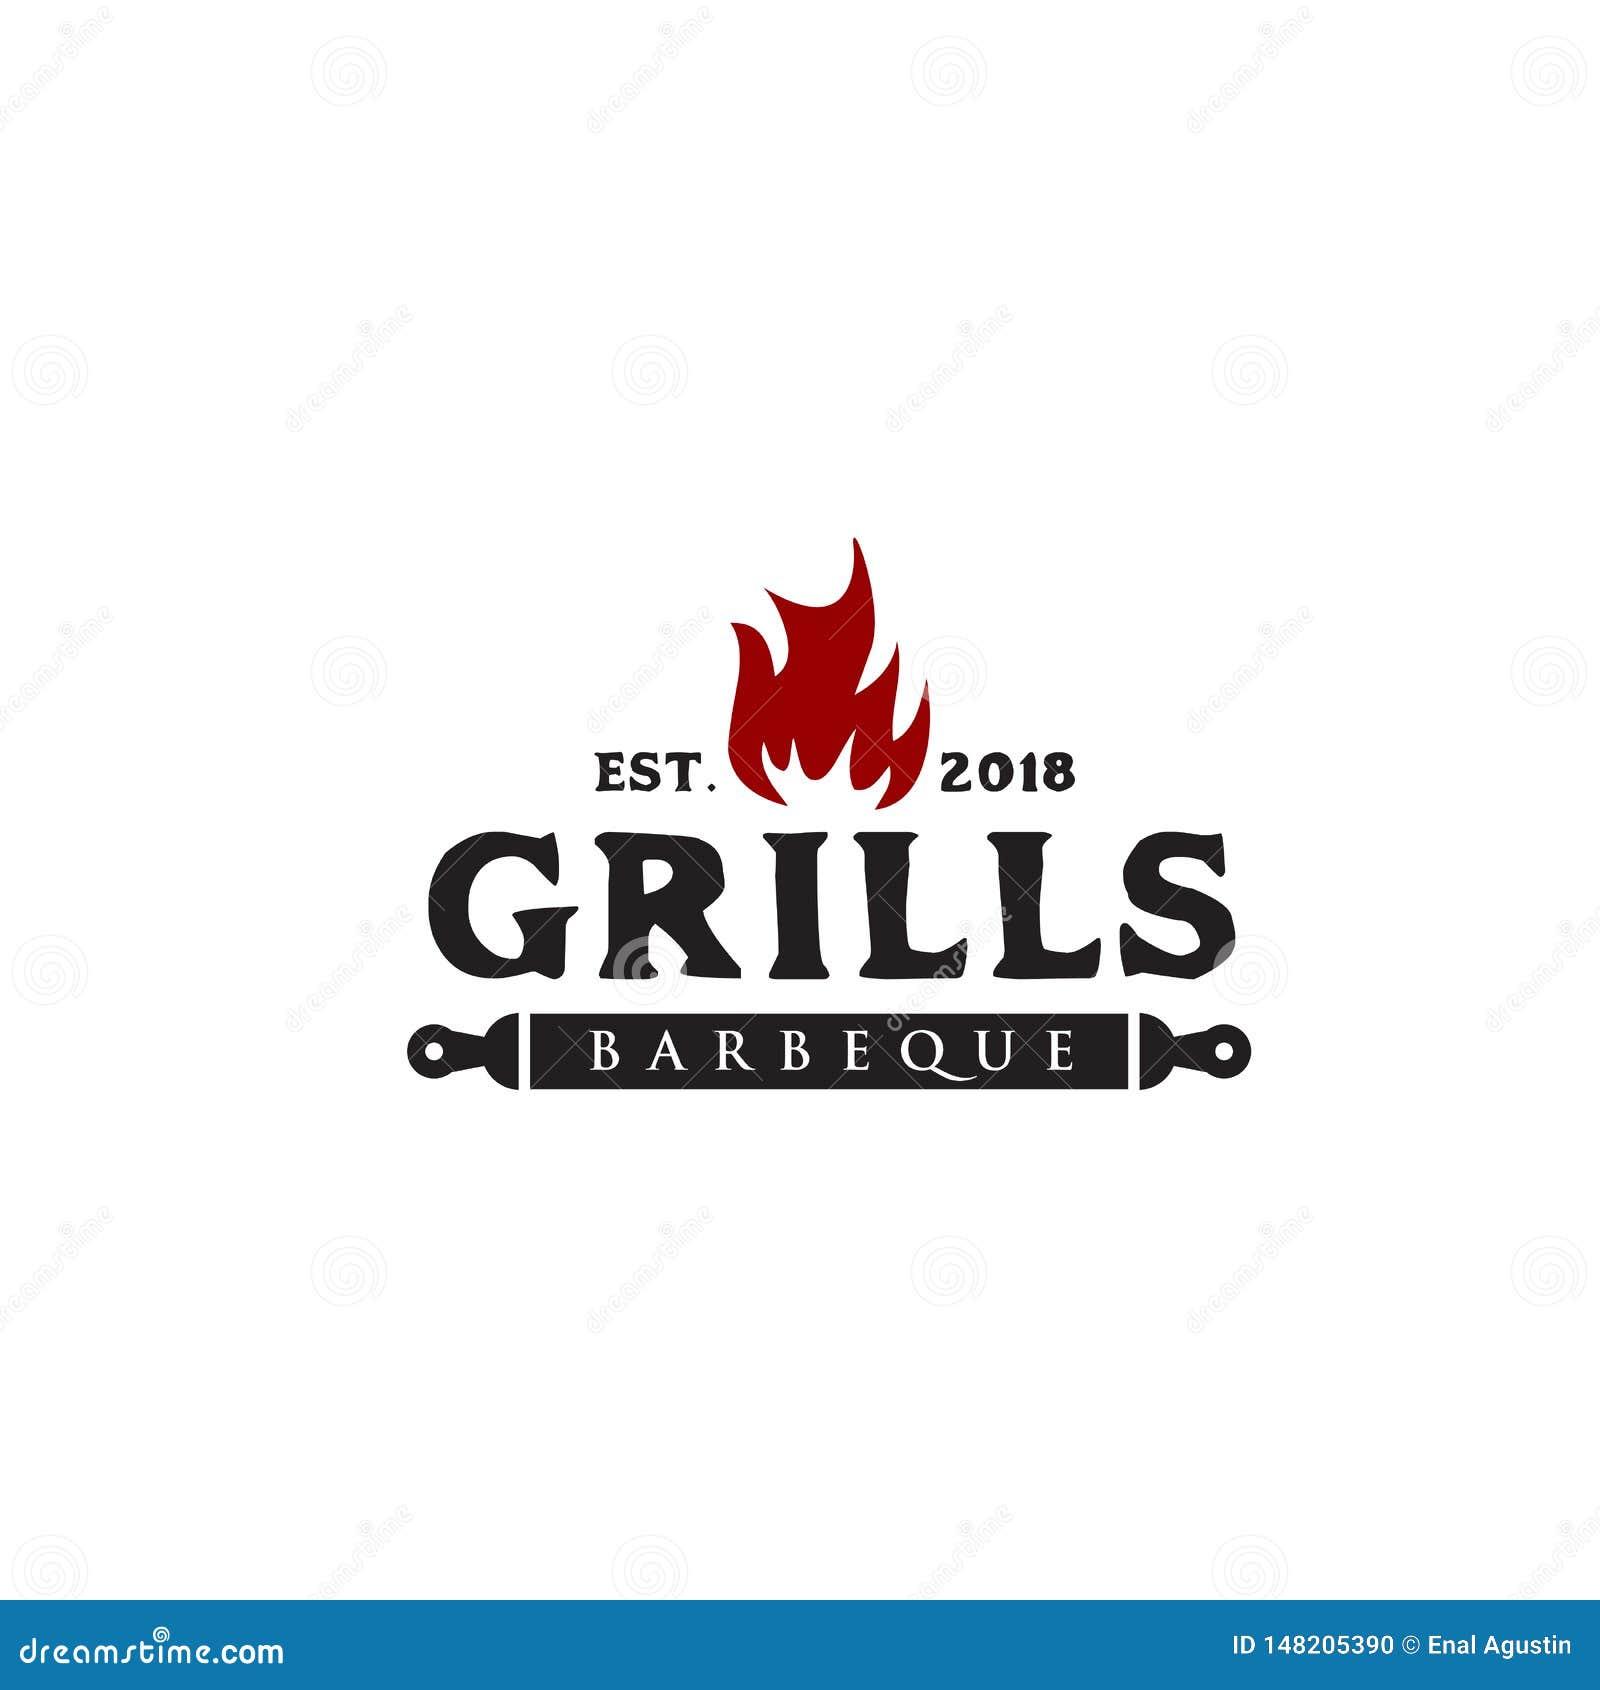 Grill barbeque logo design vector template